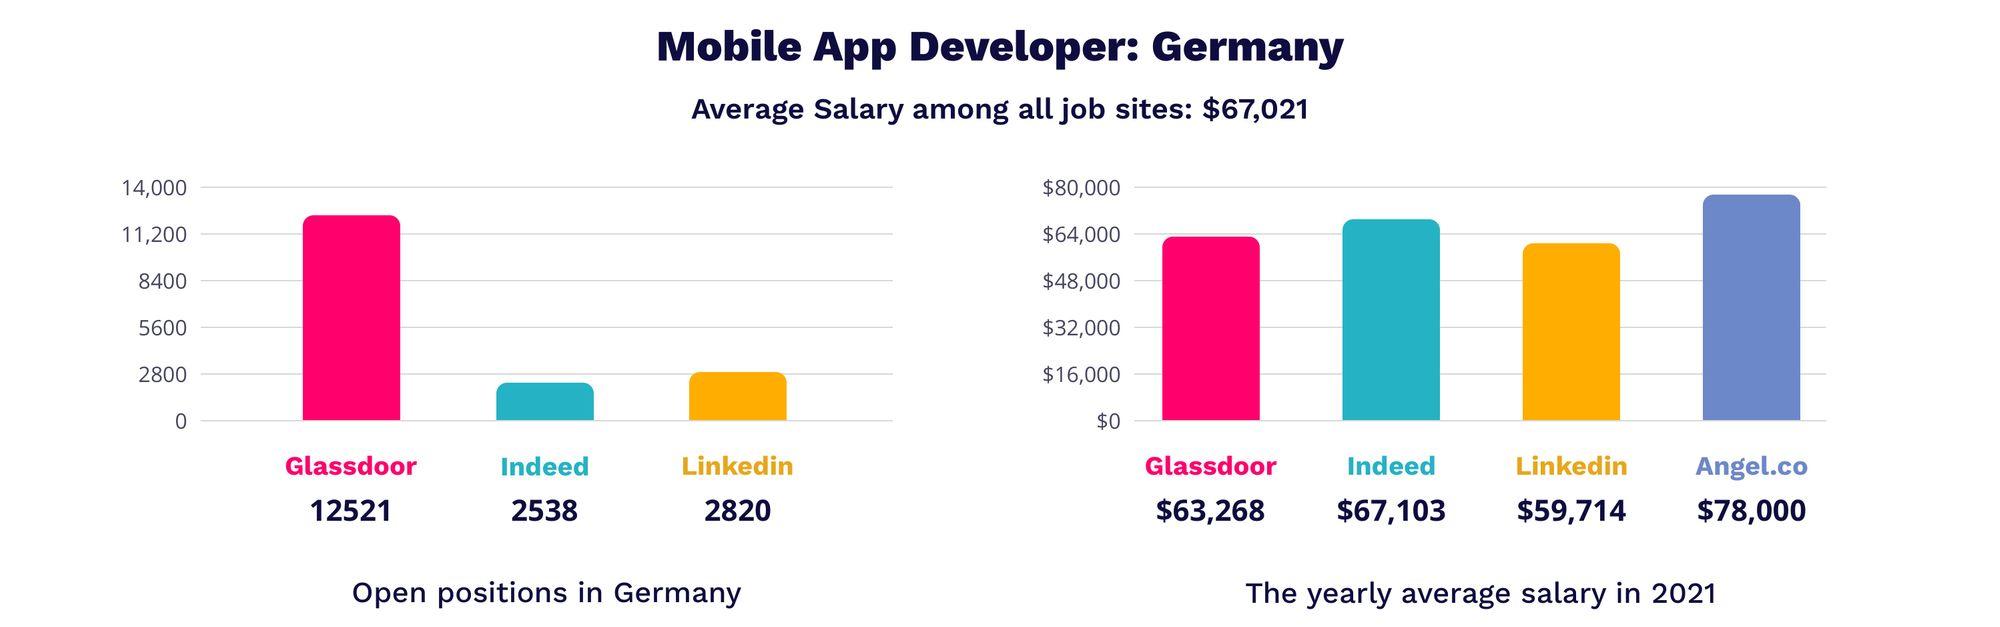 Mobile App Developer in Germany | MagicHire.co